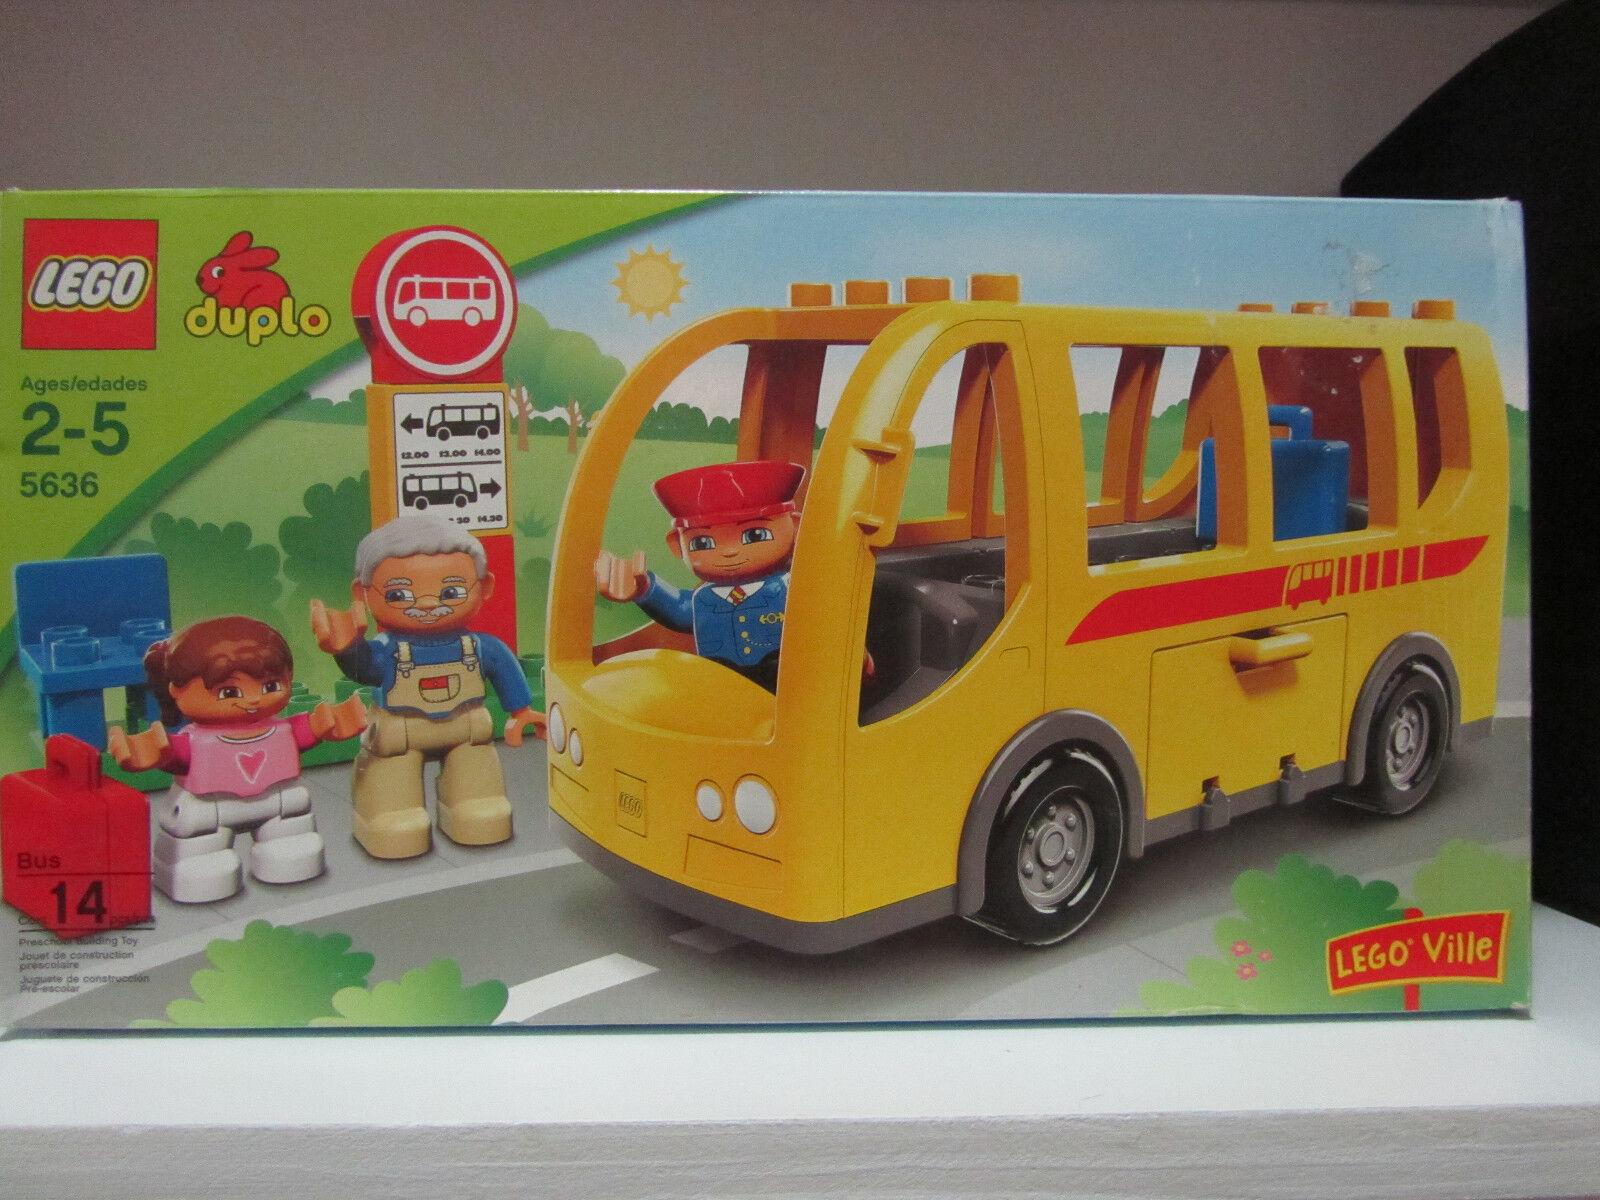 Lego Duplo Lego Ville 5636 Big School Bus Vehicle People  NEW SEALED   Lot Set